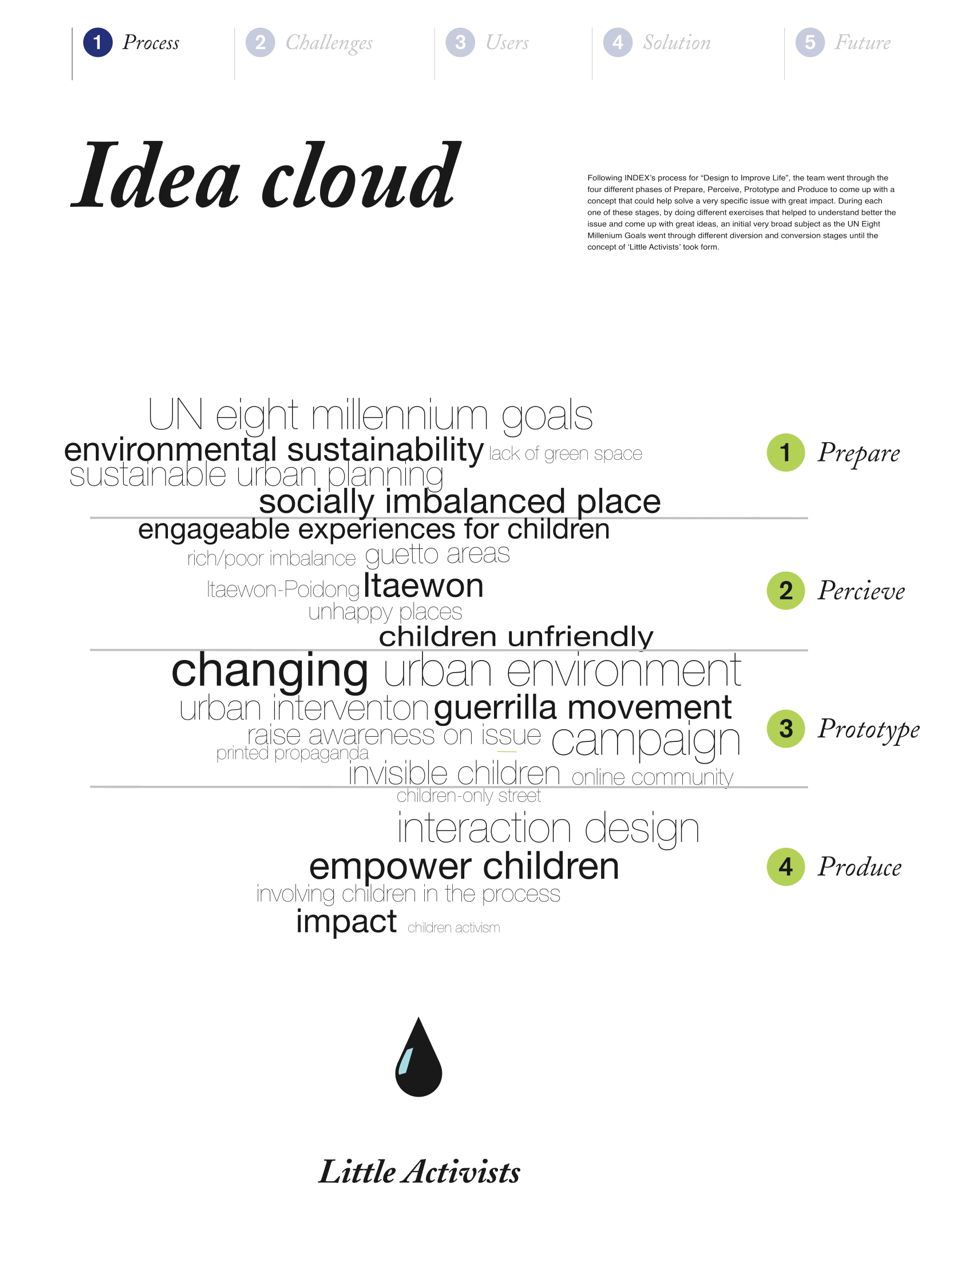 The idea cloud visualizes the process funnel.